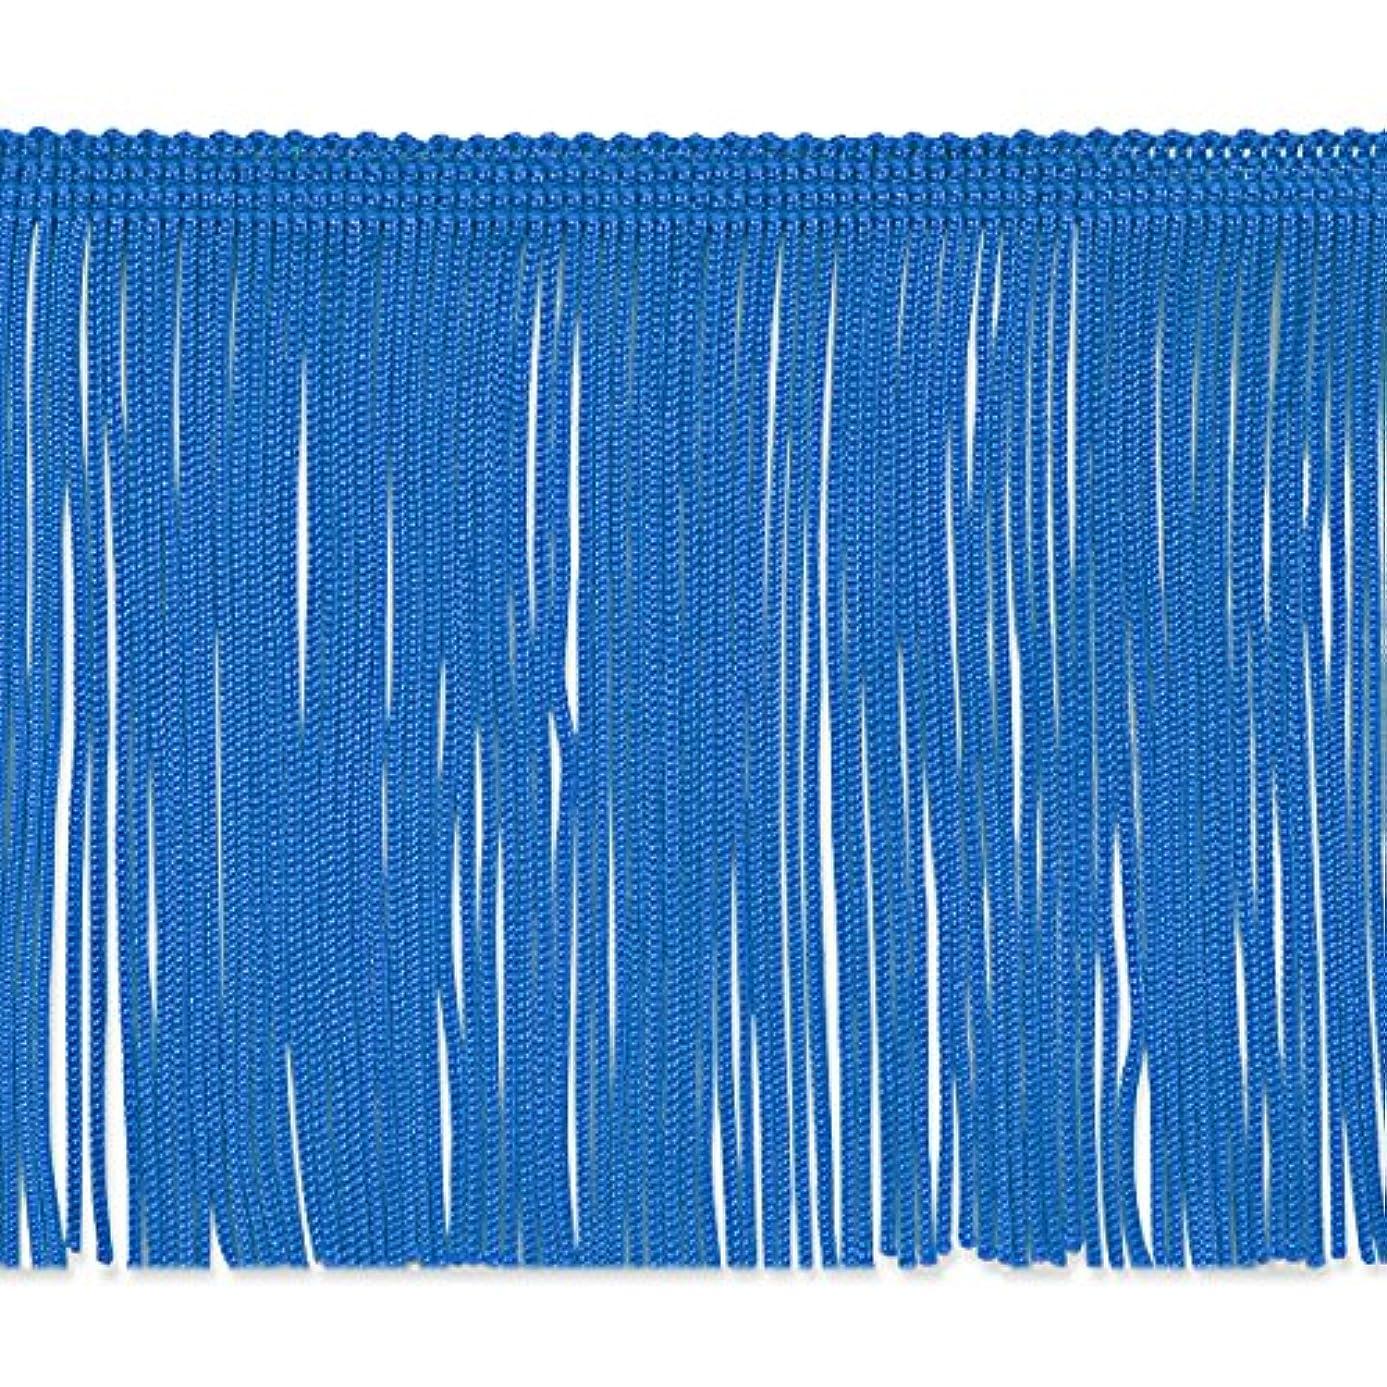 Expo International 4-Inch Chainette Fringe Trim Embellishment, 20-Yard, Royal Blue